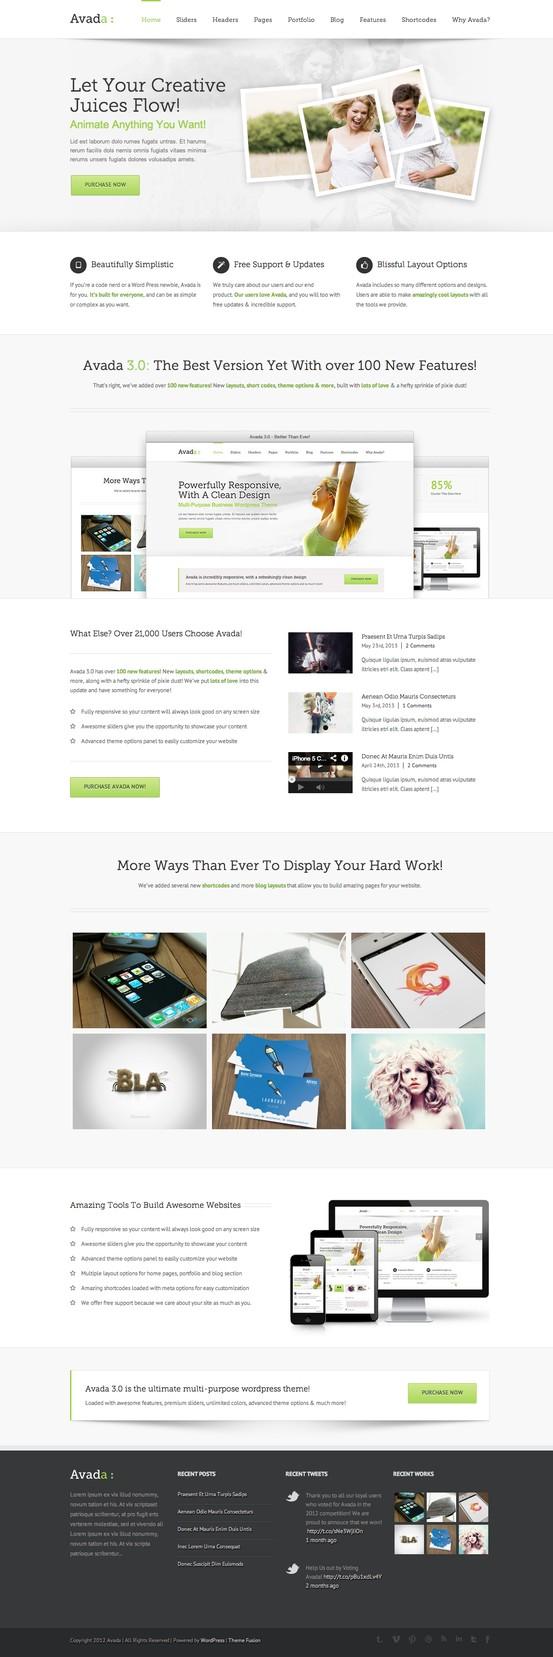 Avada | Responsive Multi-Purpose Theme #wordpress #theme #template ...